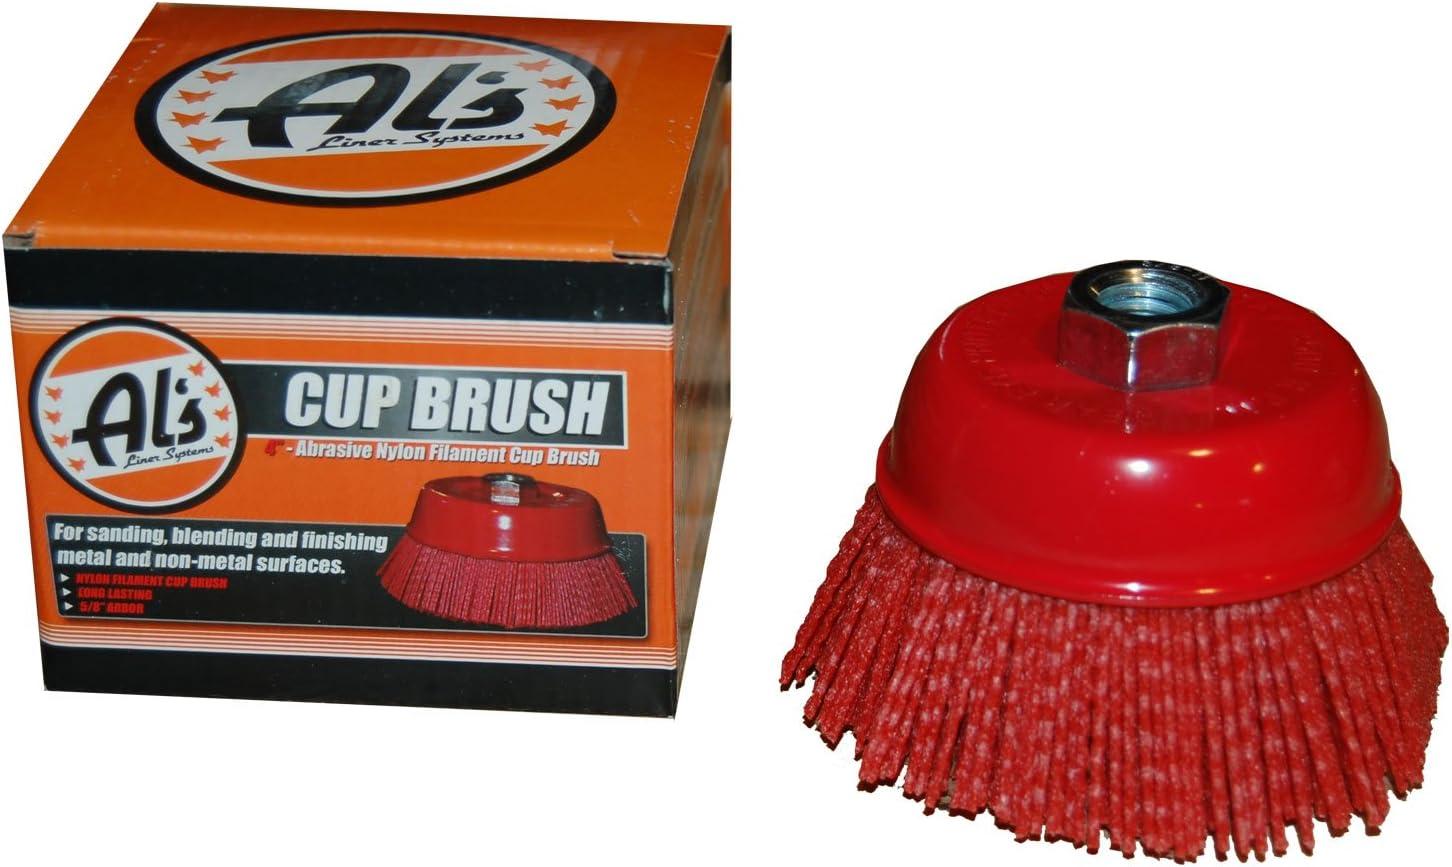 180 Grit Al/'s Liner TOOR4 4 Inch Abrasive Nylon Bristle Cup Brush 1 Pack